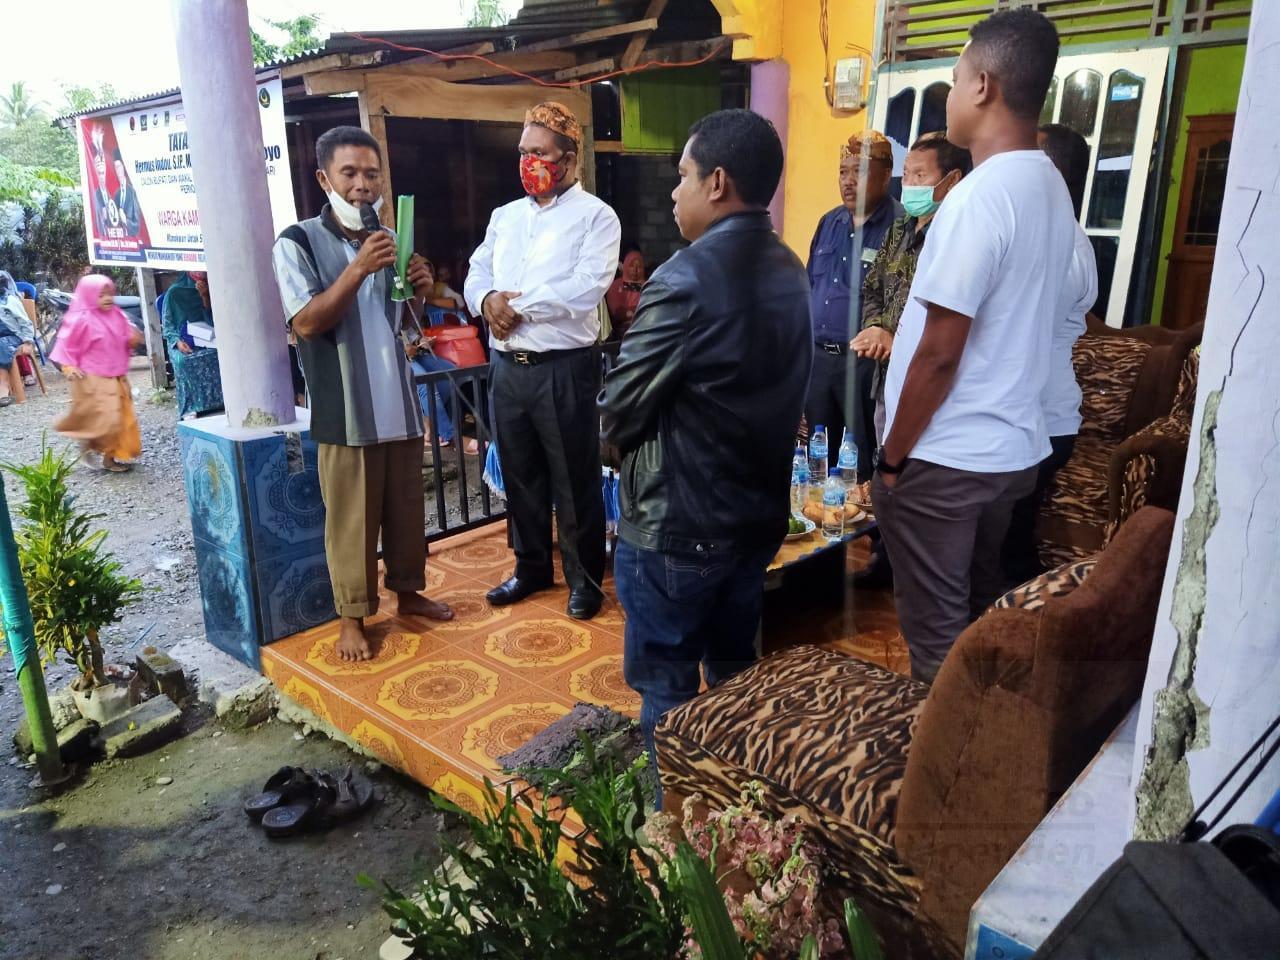 Keluh Jalan Rusak Sejak Tahun 1986, Warga Kampung Wariori Percaya Hermus-Edi Pimpin Manowari Pasti Peduli 2 IMG 20201127 WA0022